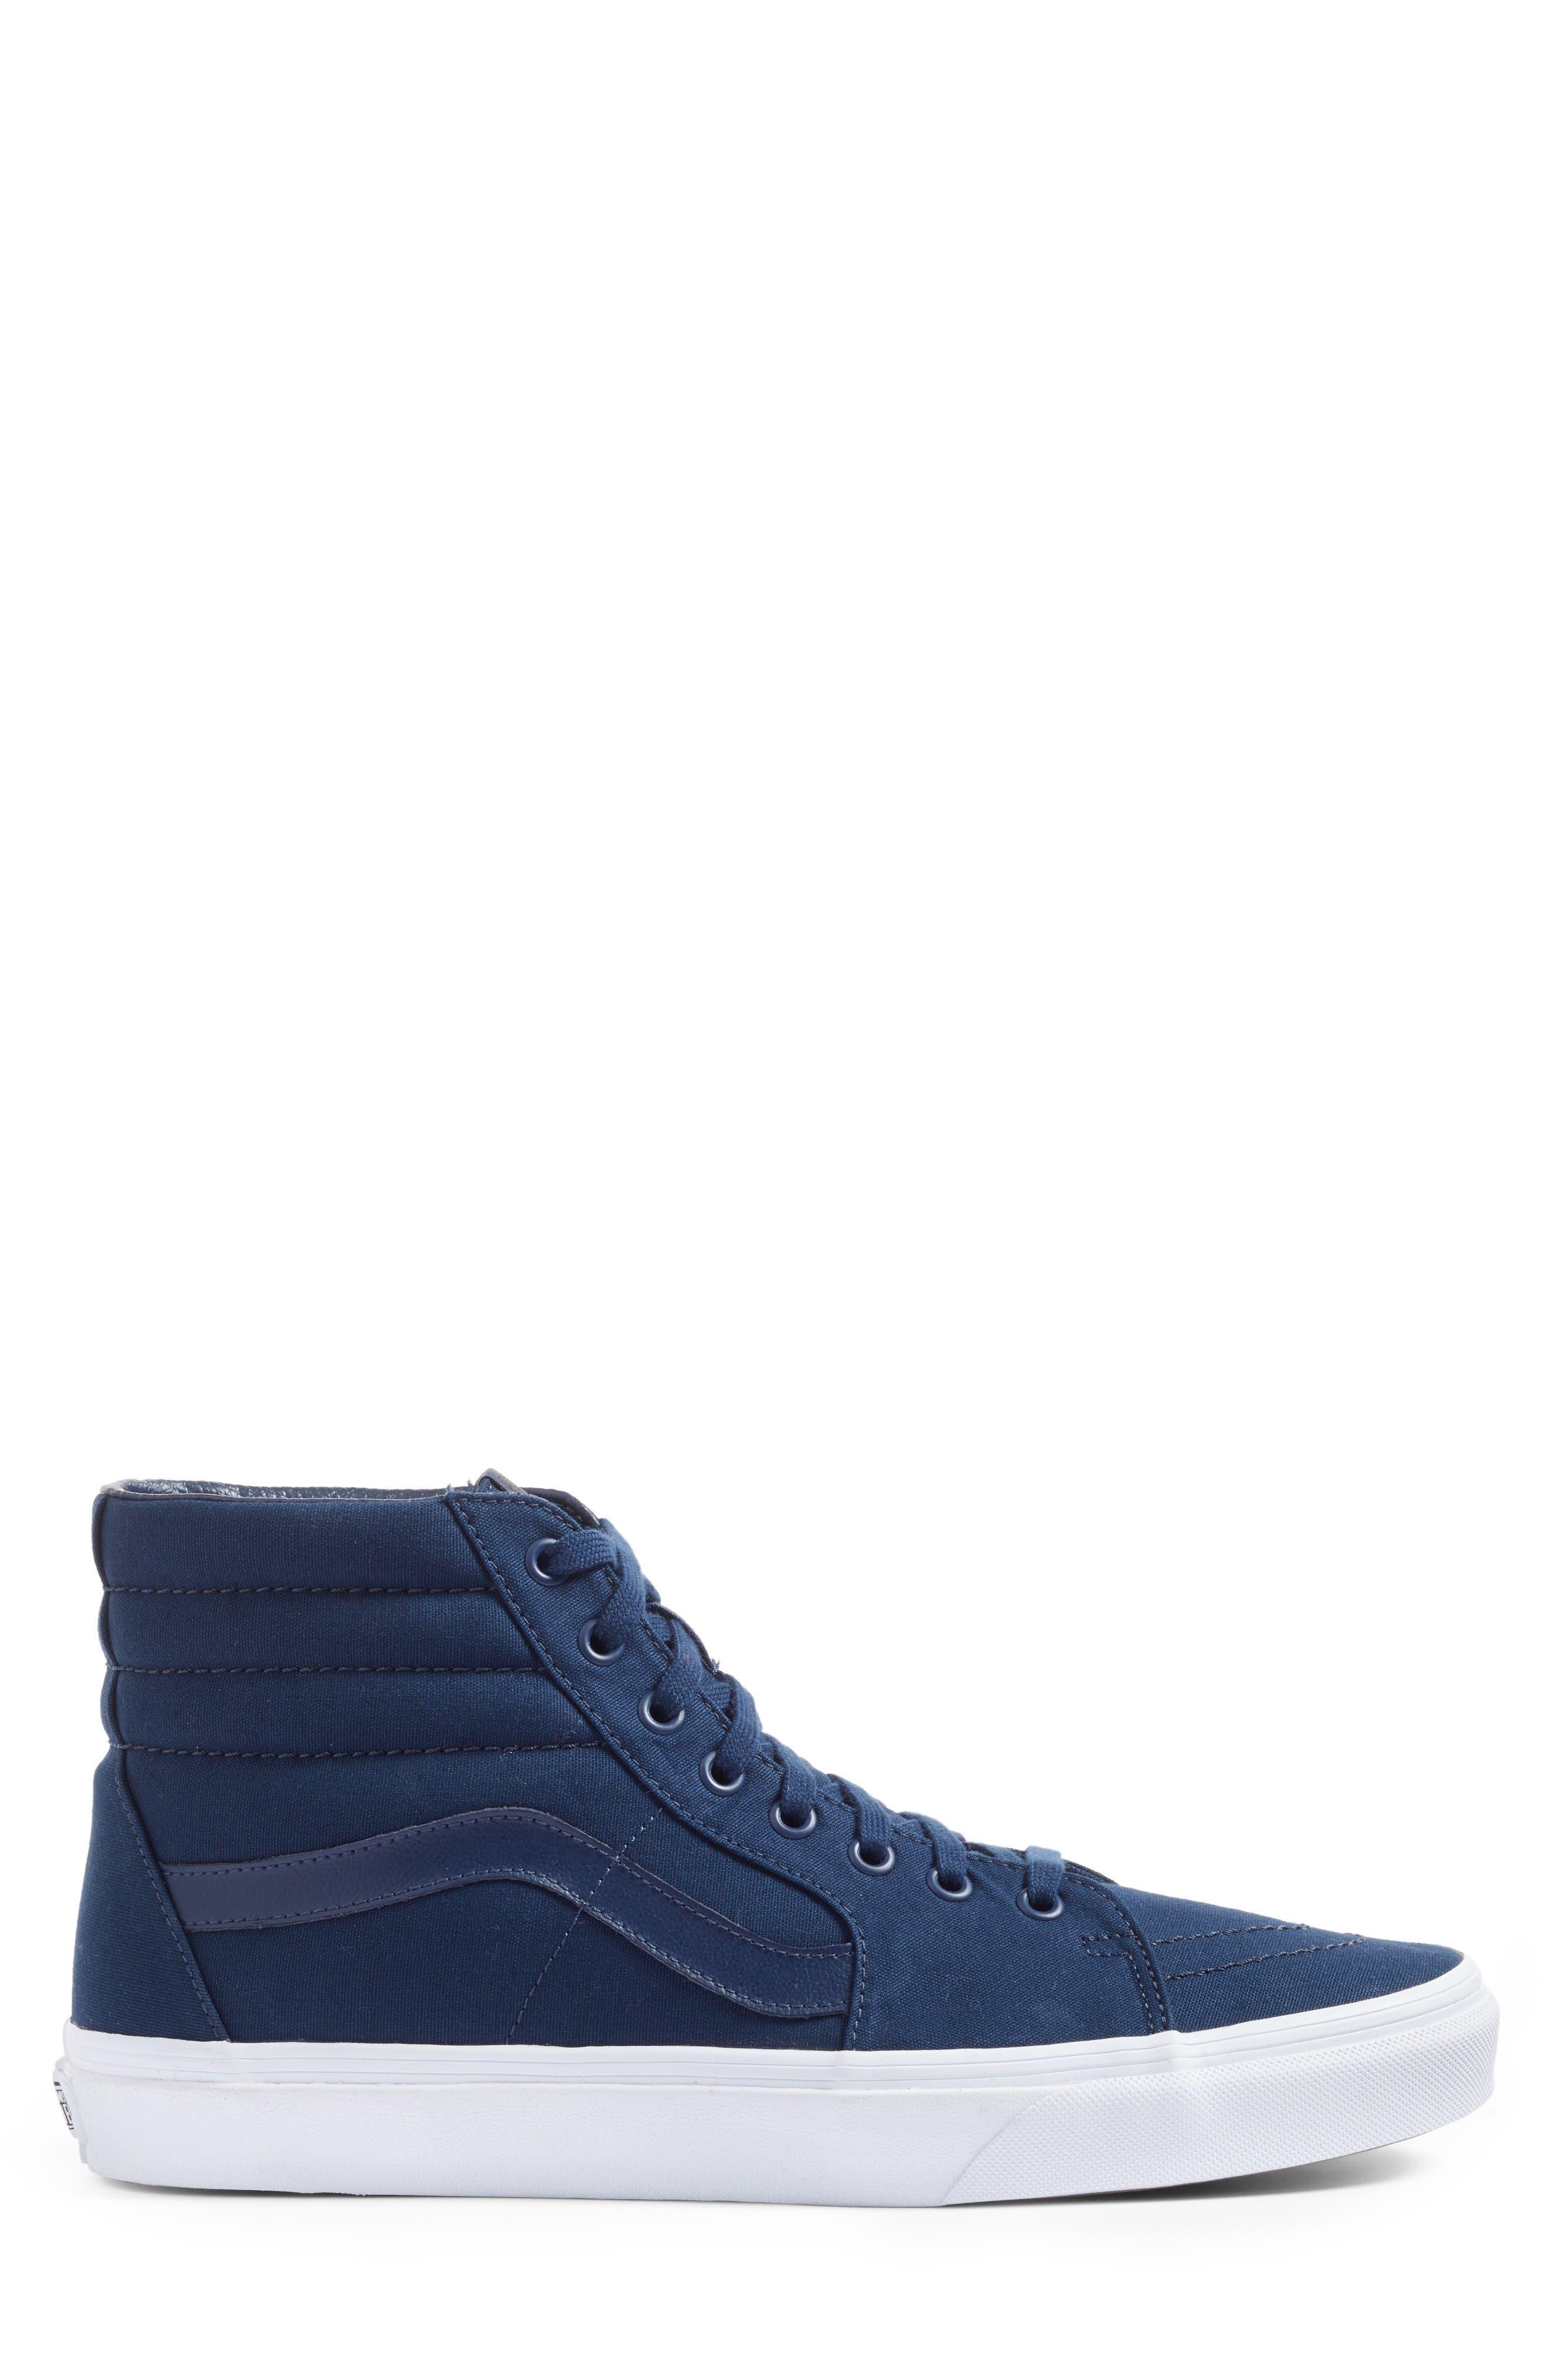 Alternate Image 3  - Vans 'Sk8-Hi' Sneaker (Men)